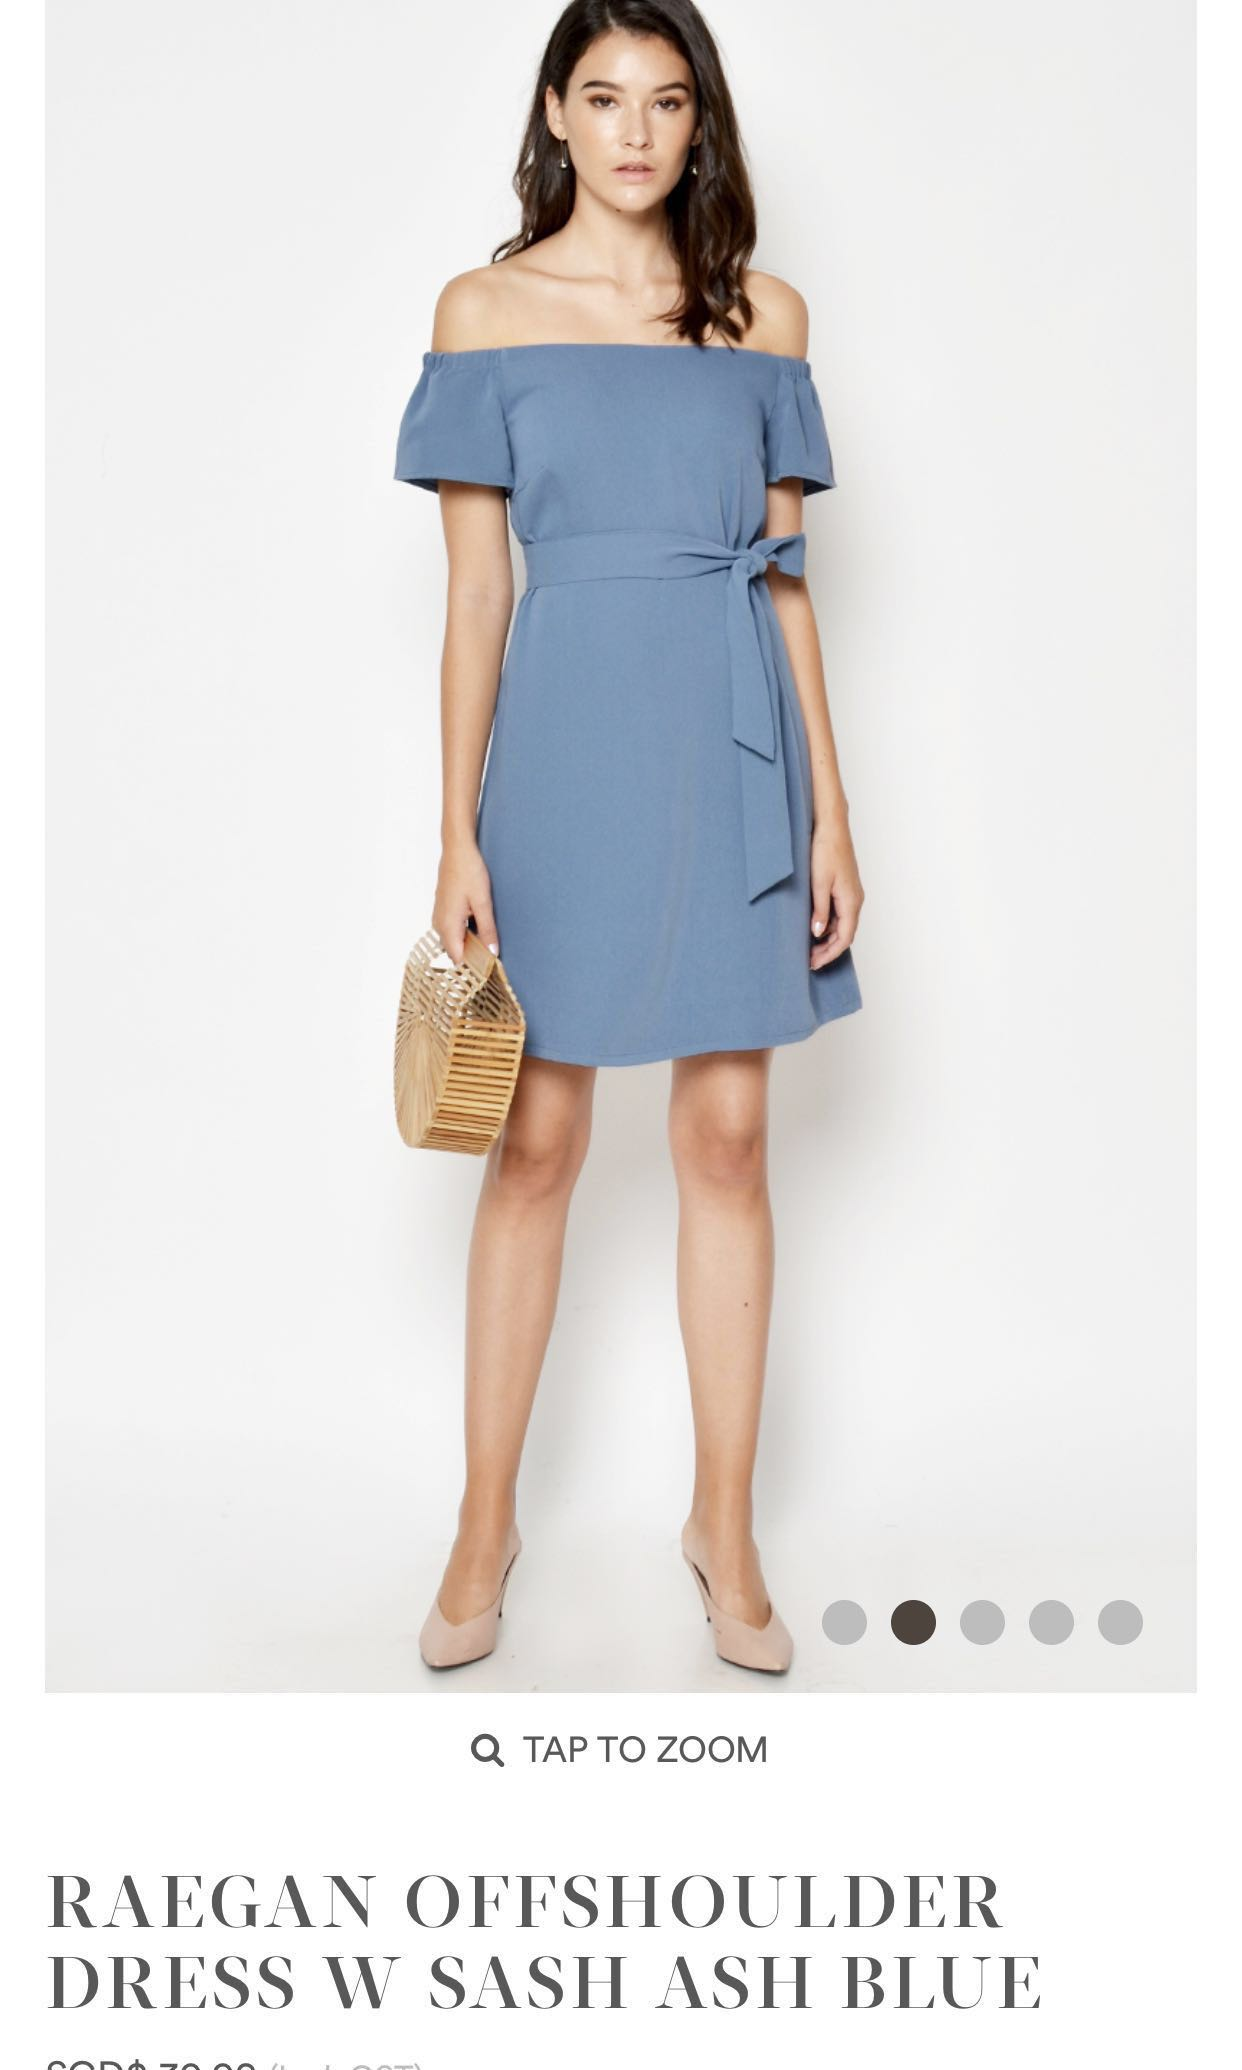 32408f792a BNWT Off-Shoulder Dress with Sash